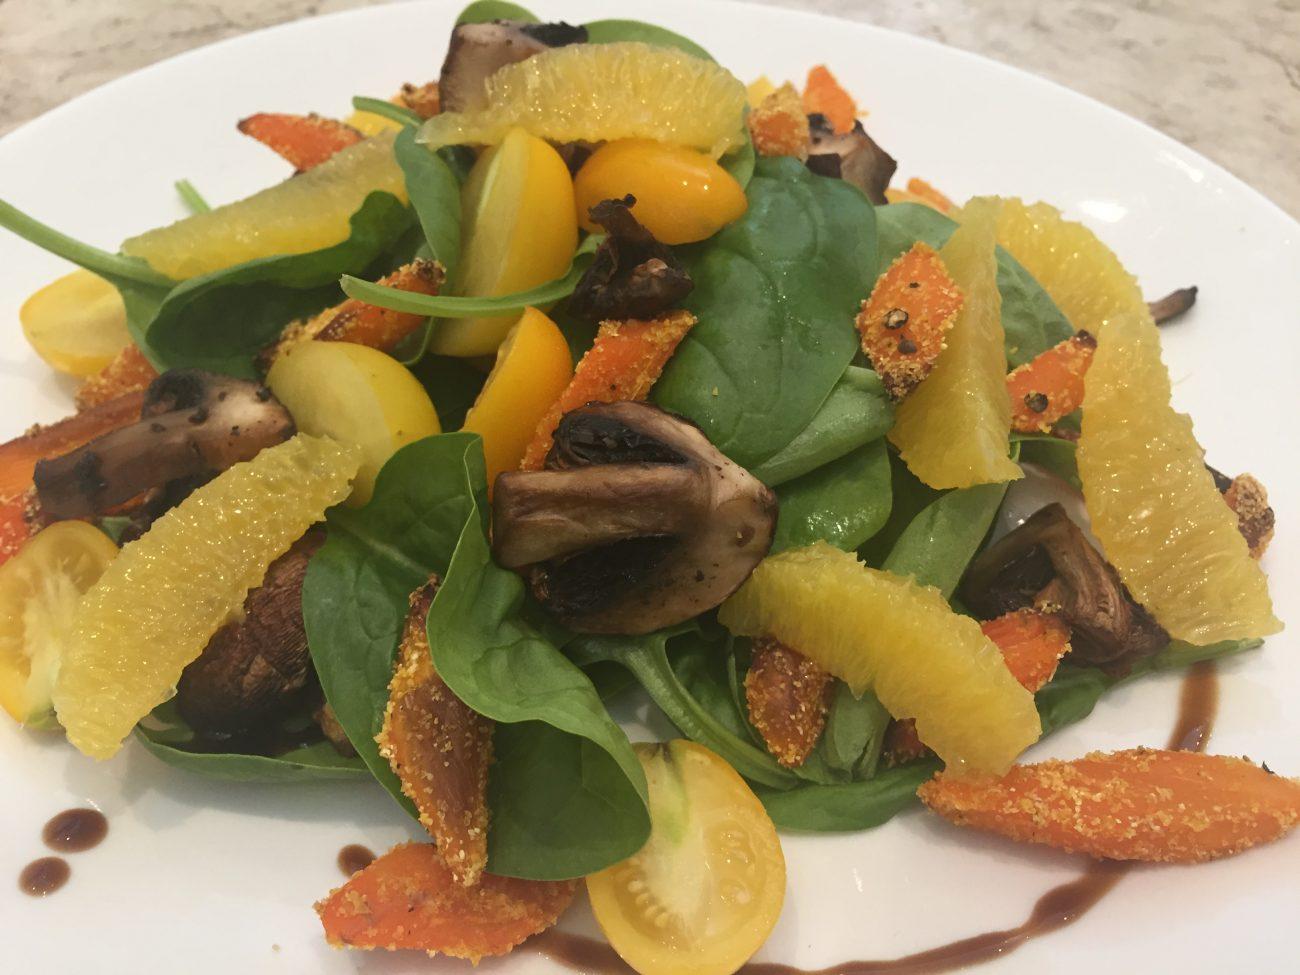 Crispy Ginger Carrot & Orange Salad